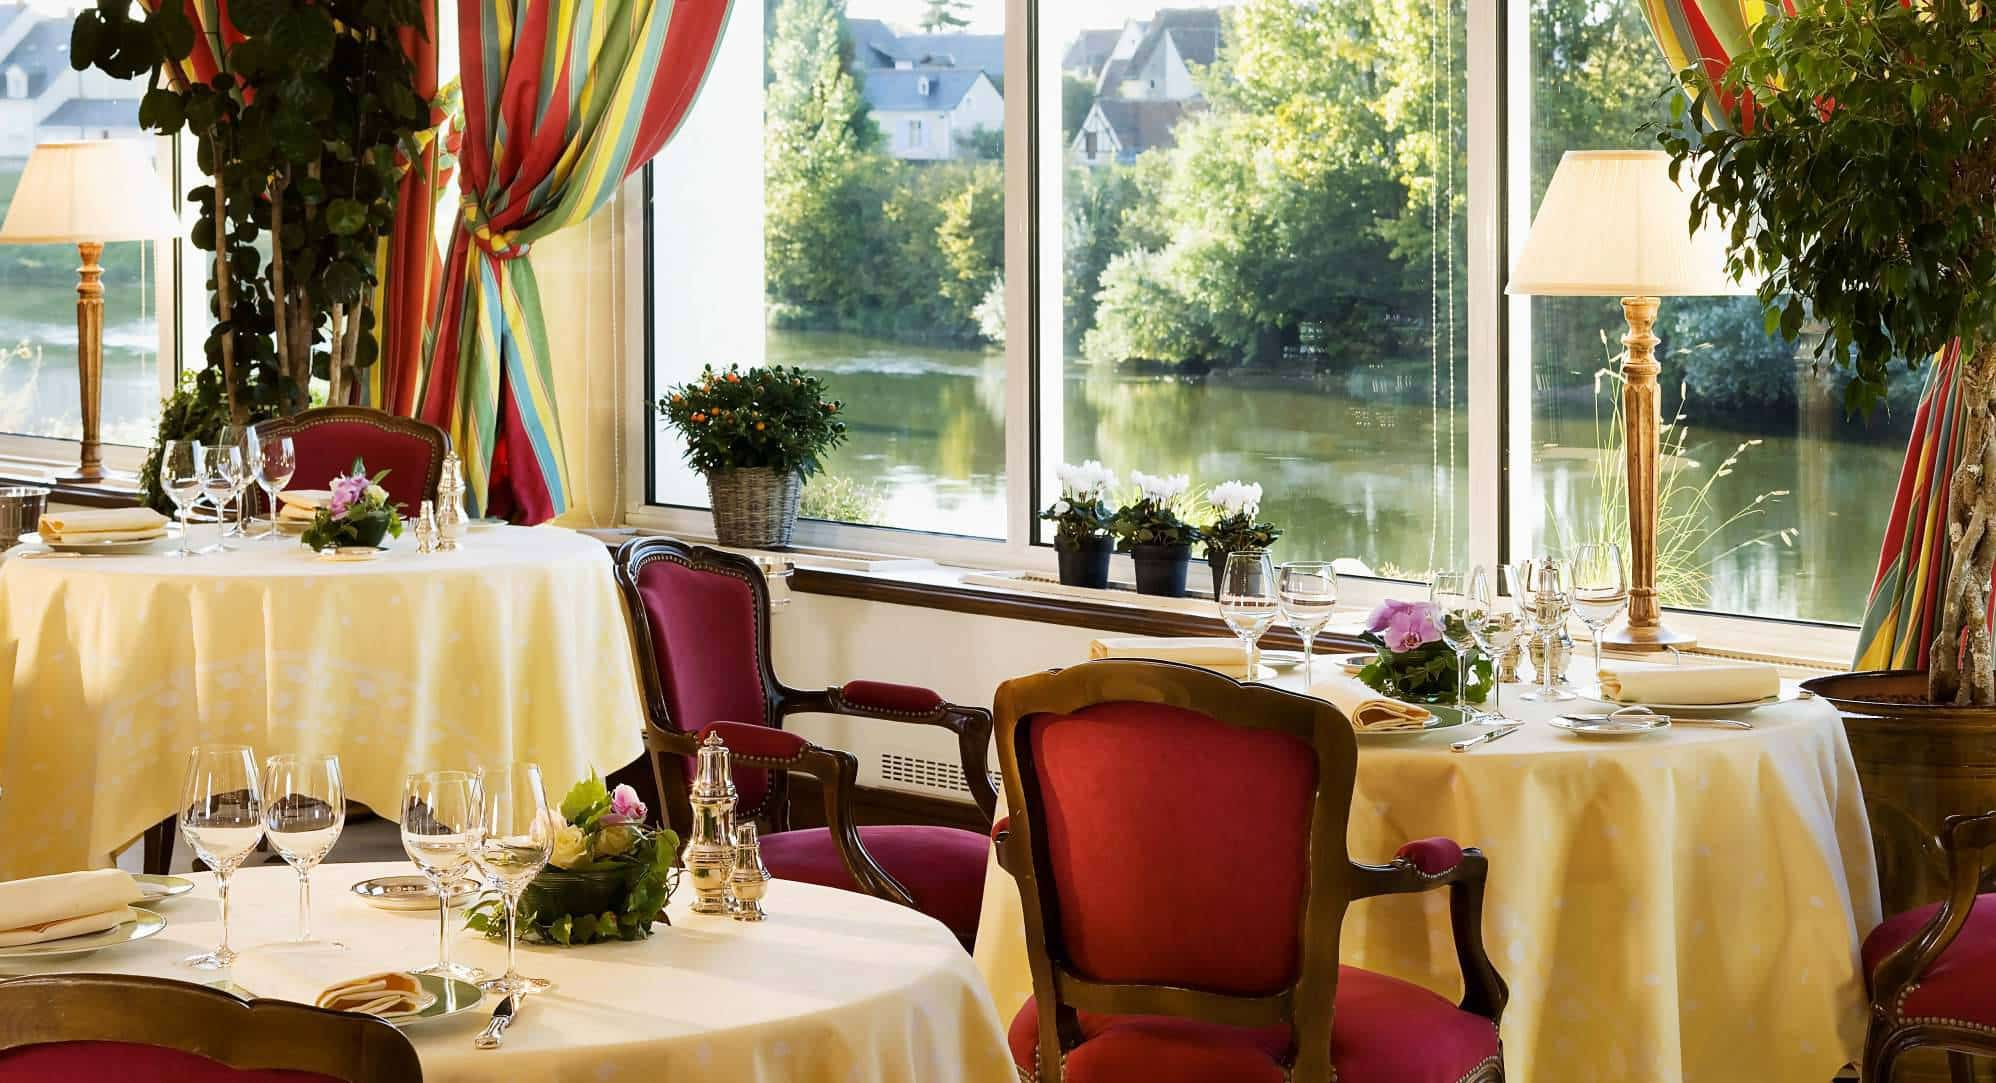 Restaurant le 36 - Amboise